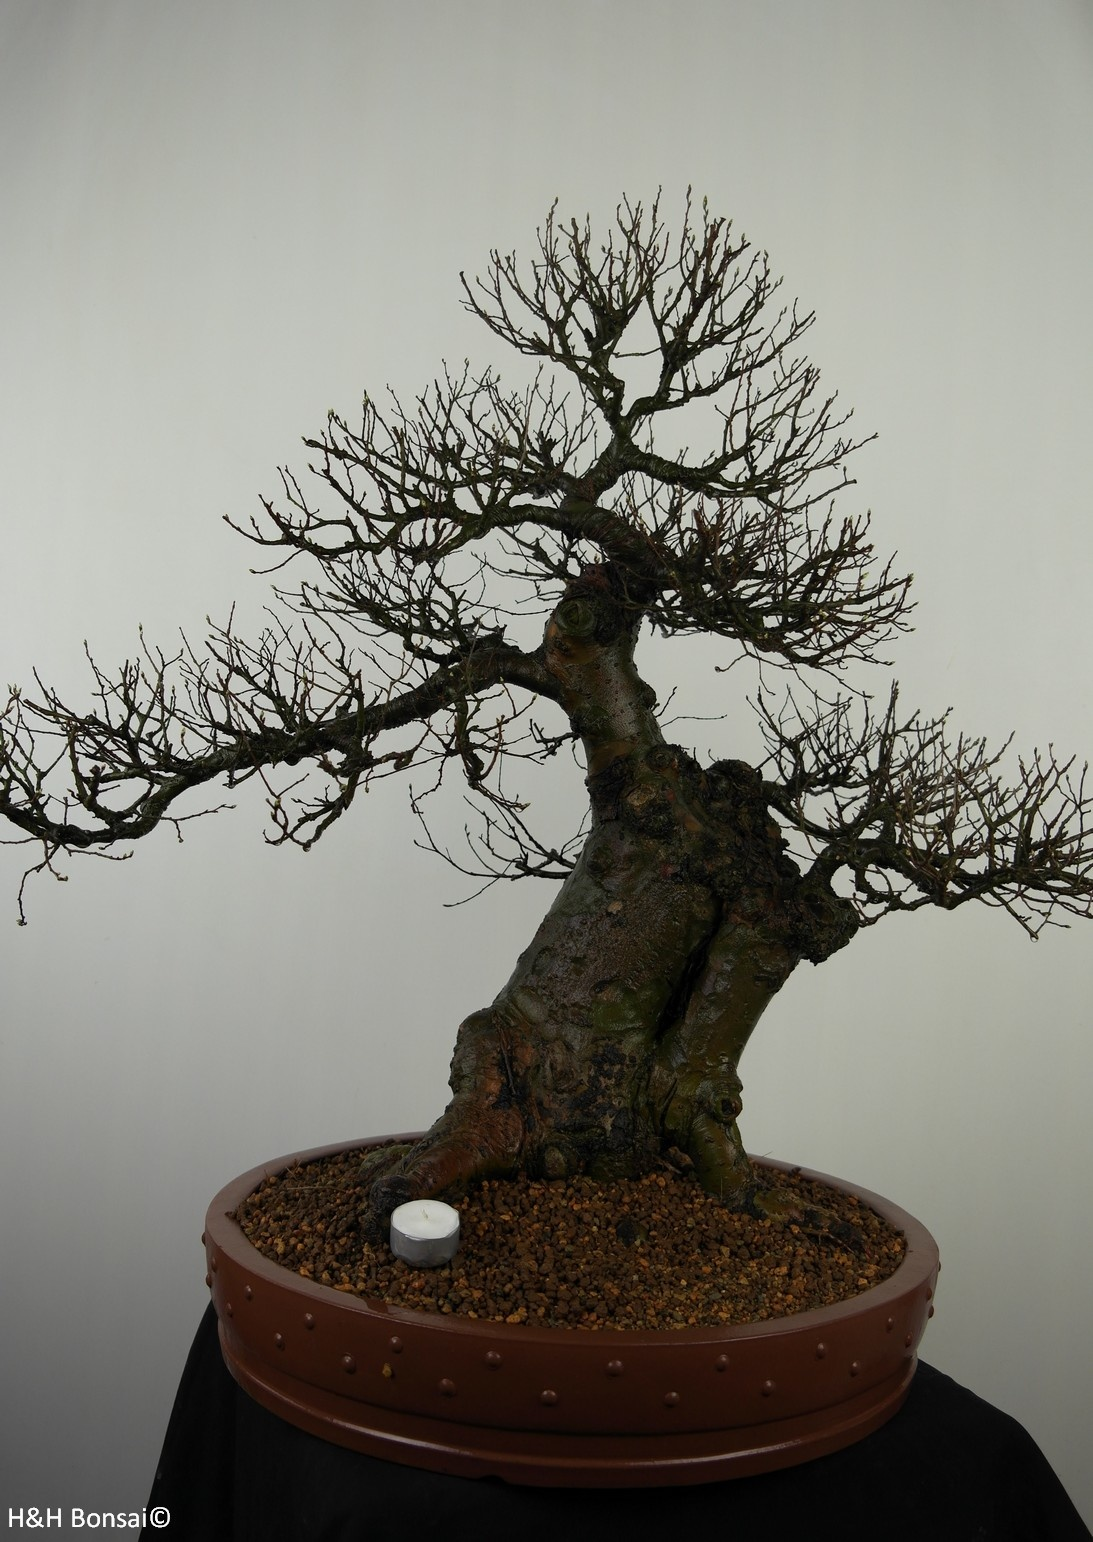 Bonsai Orme de Chine, Ulmus, no. 7519